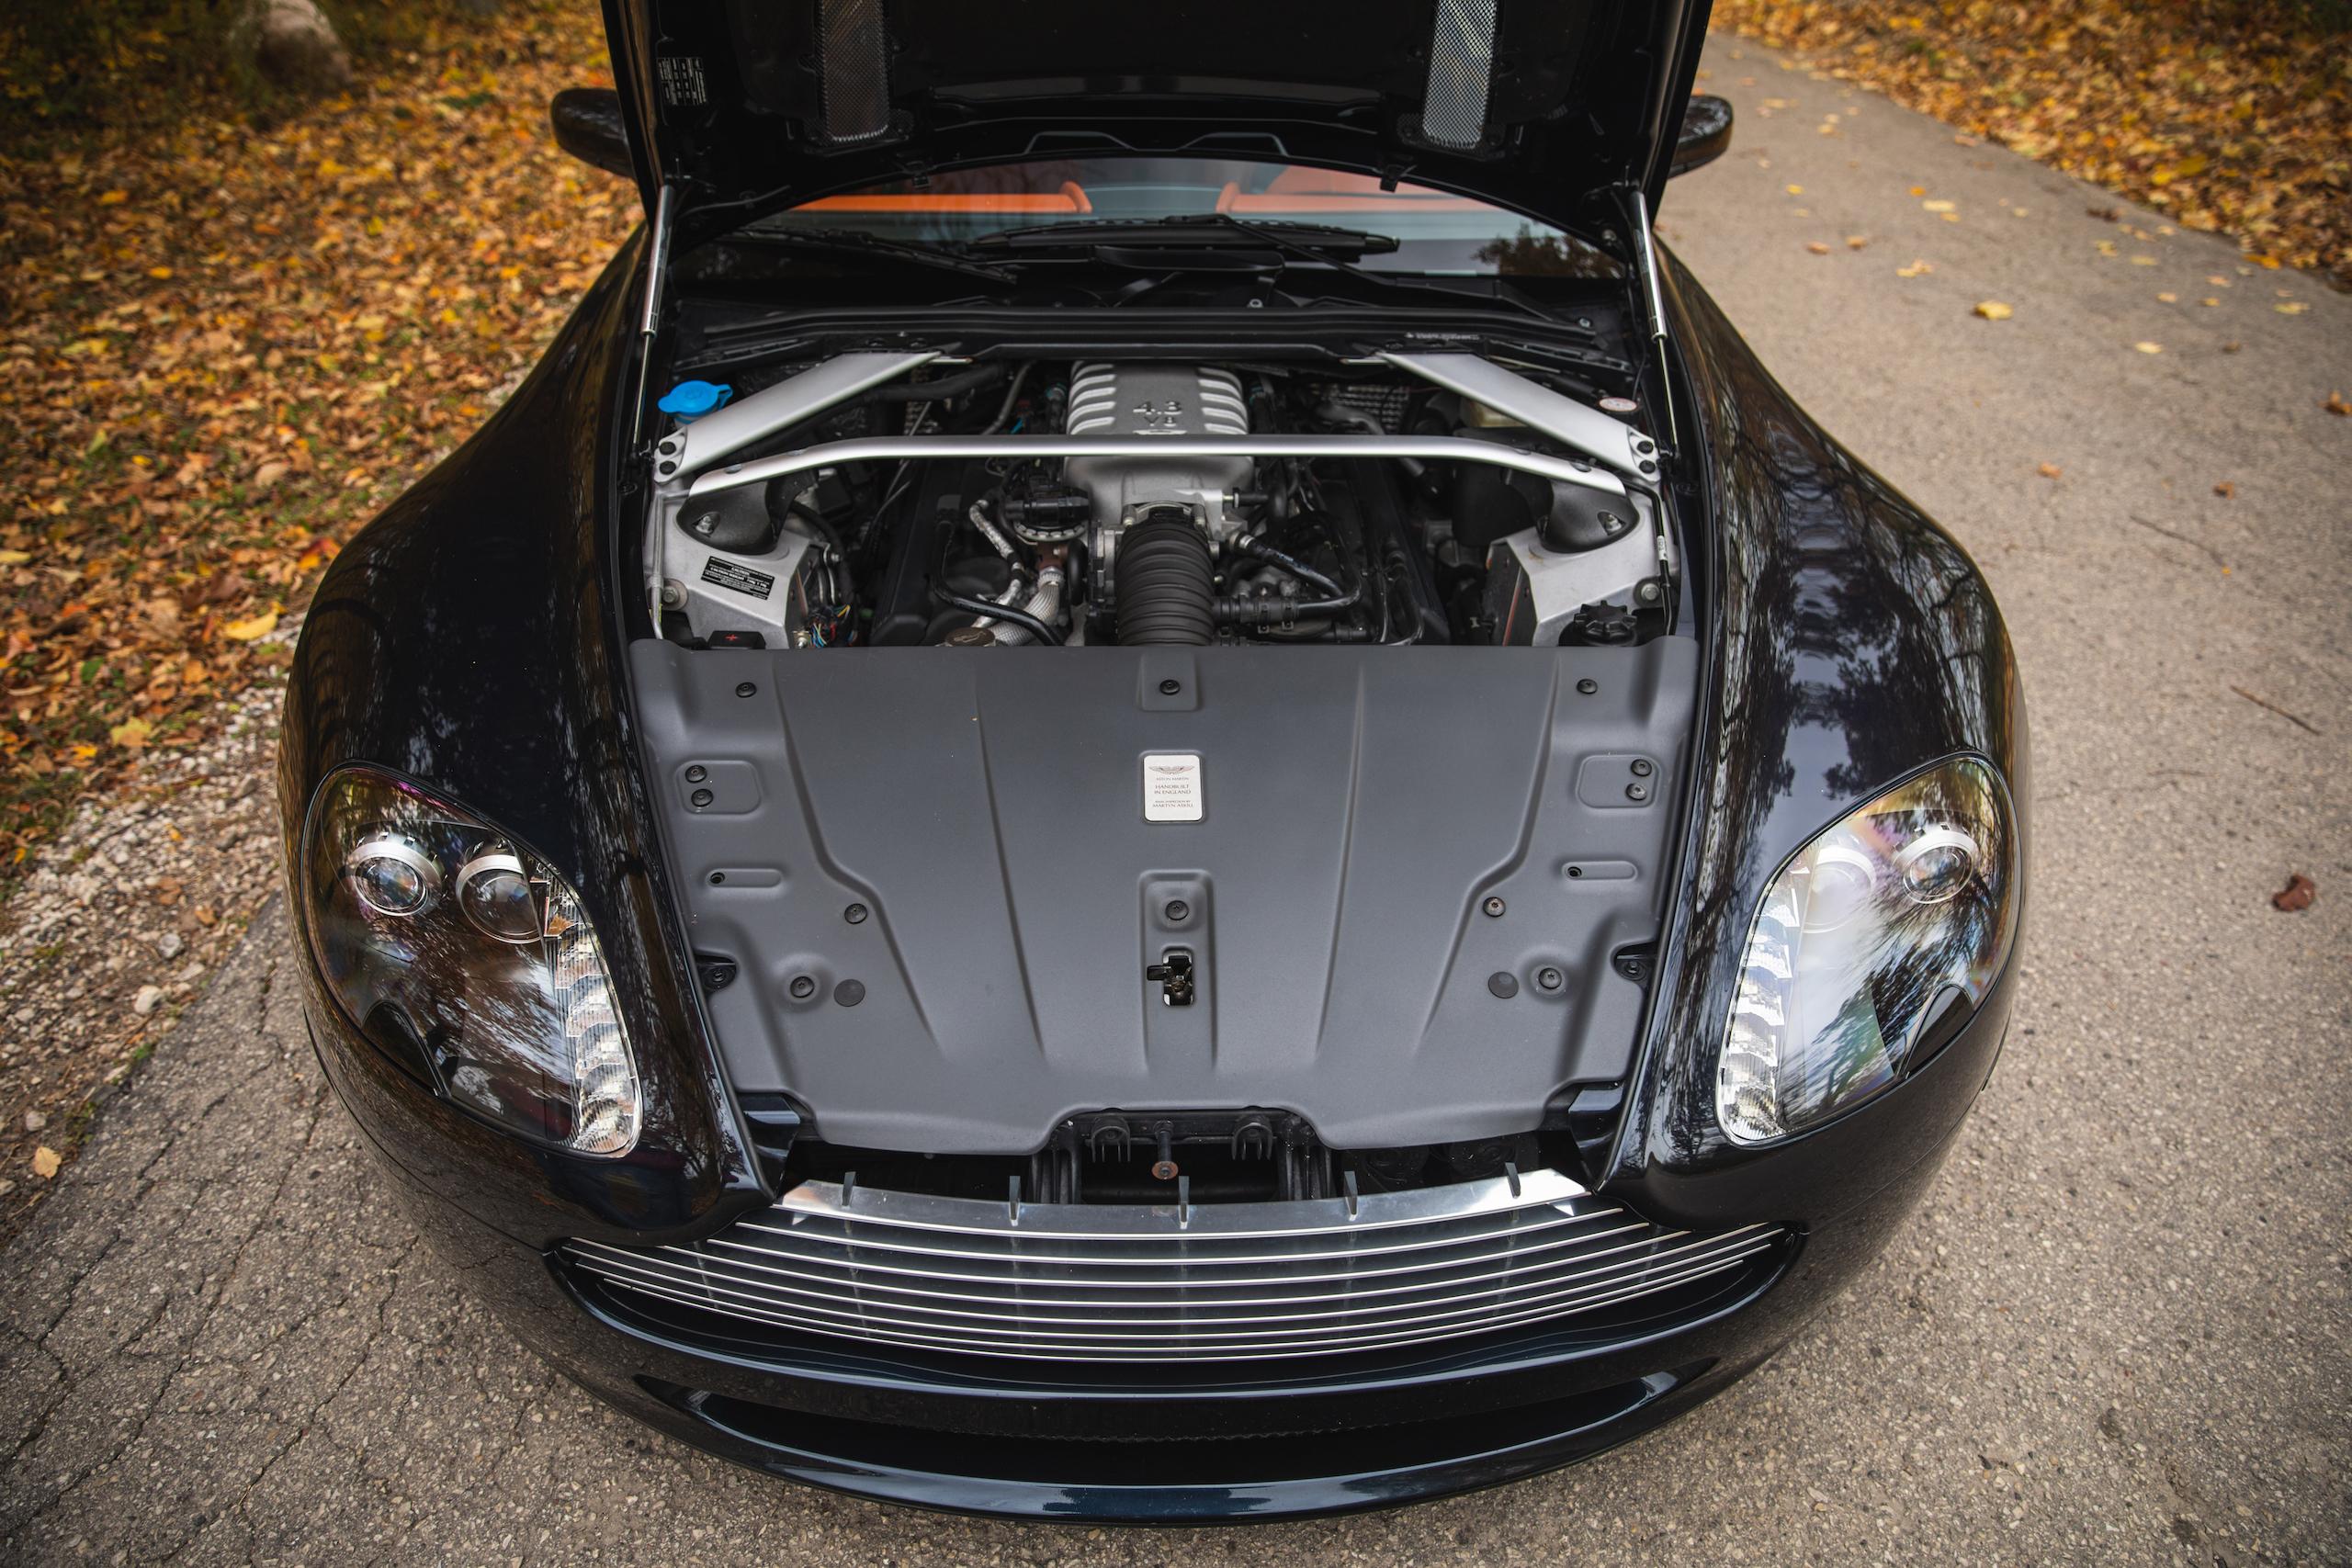 2007 Aston Martin Vantage V8 front engine bay